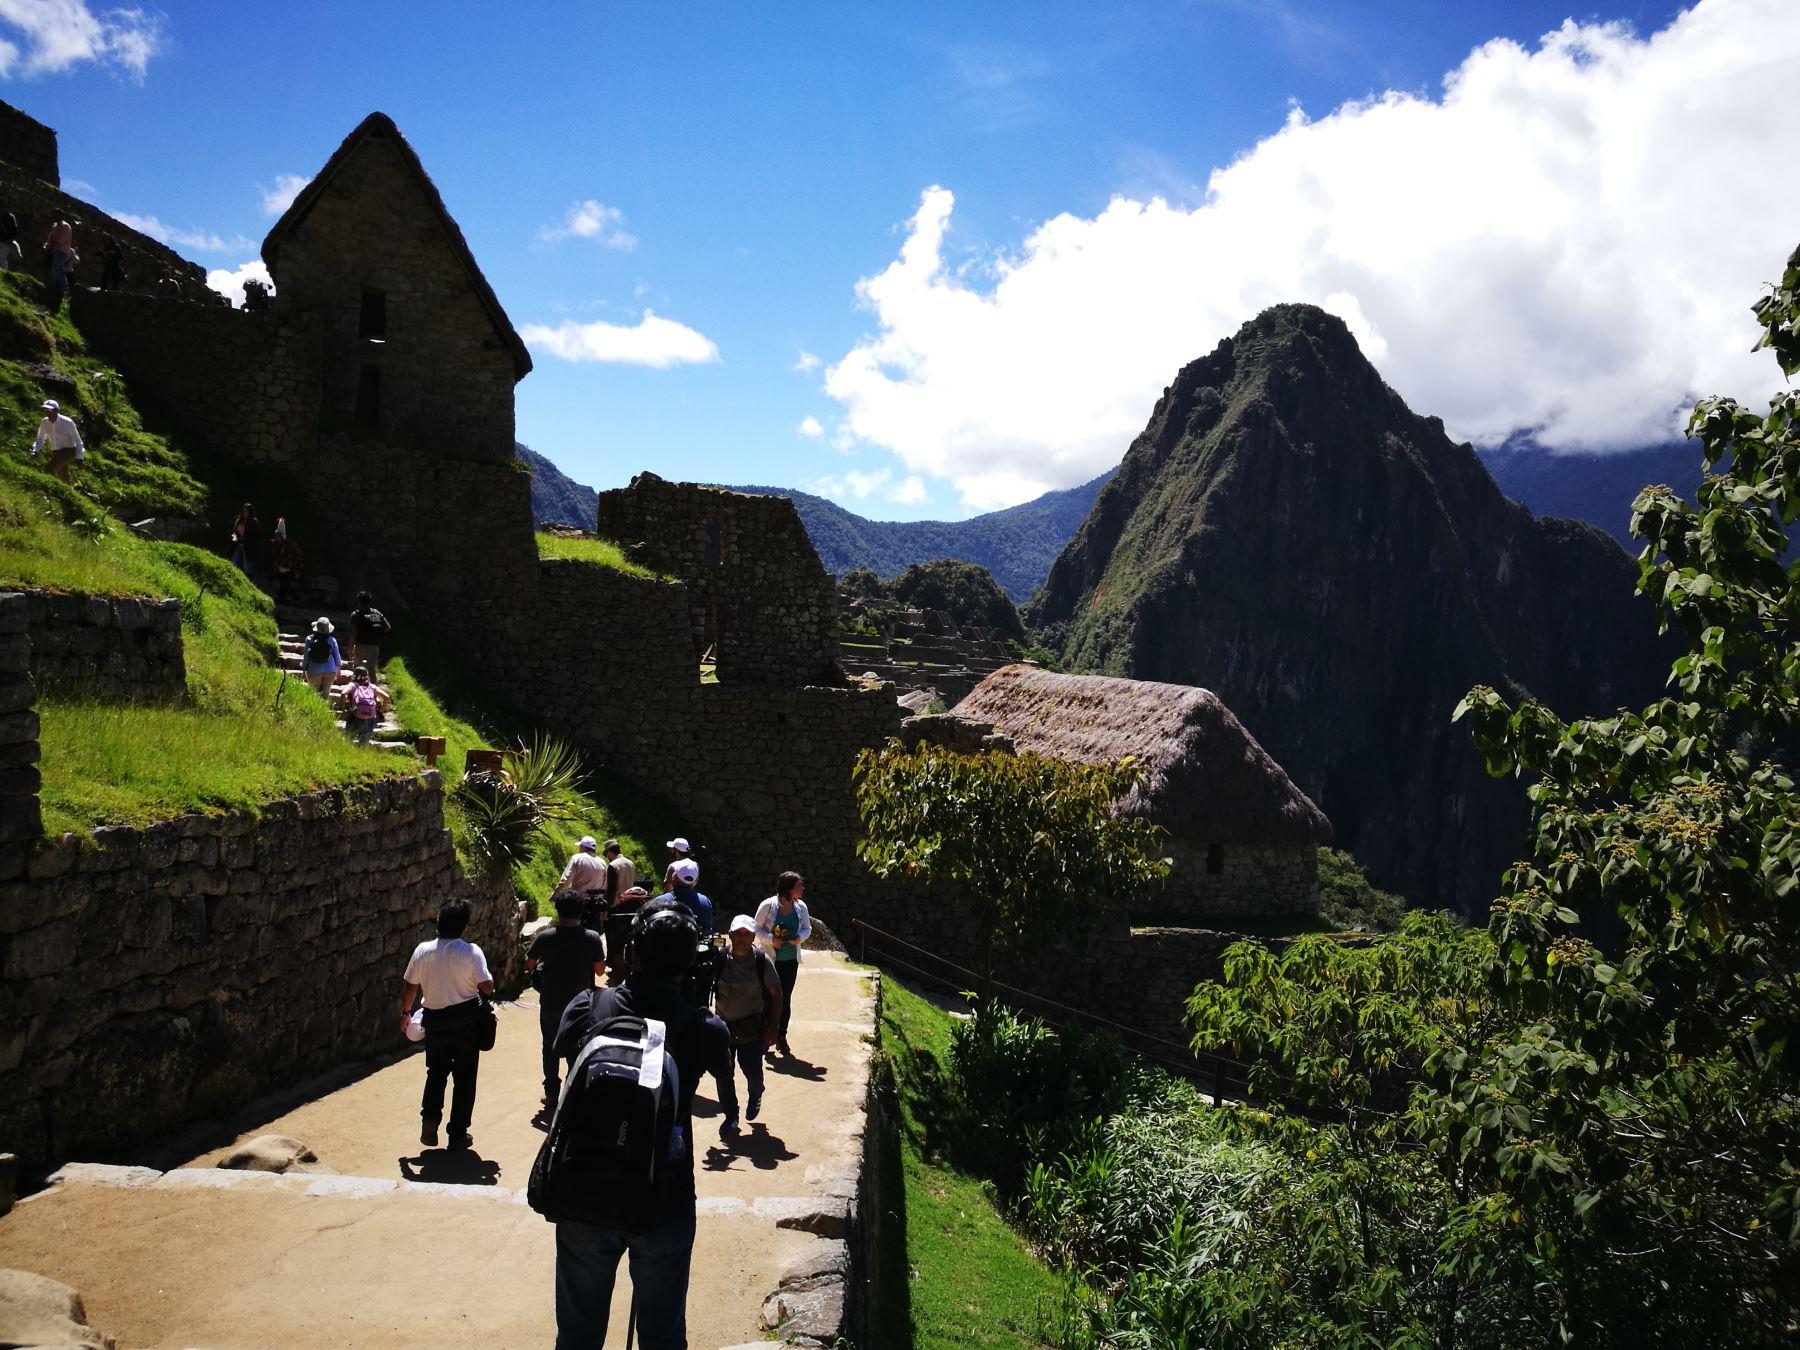 Autoridades unen esfuerzos para la conservación del Santuario Histórico Machu Picchu, en Cusco. ANDINA/Difusión